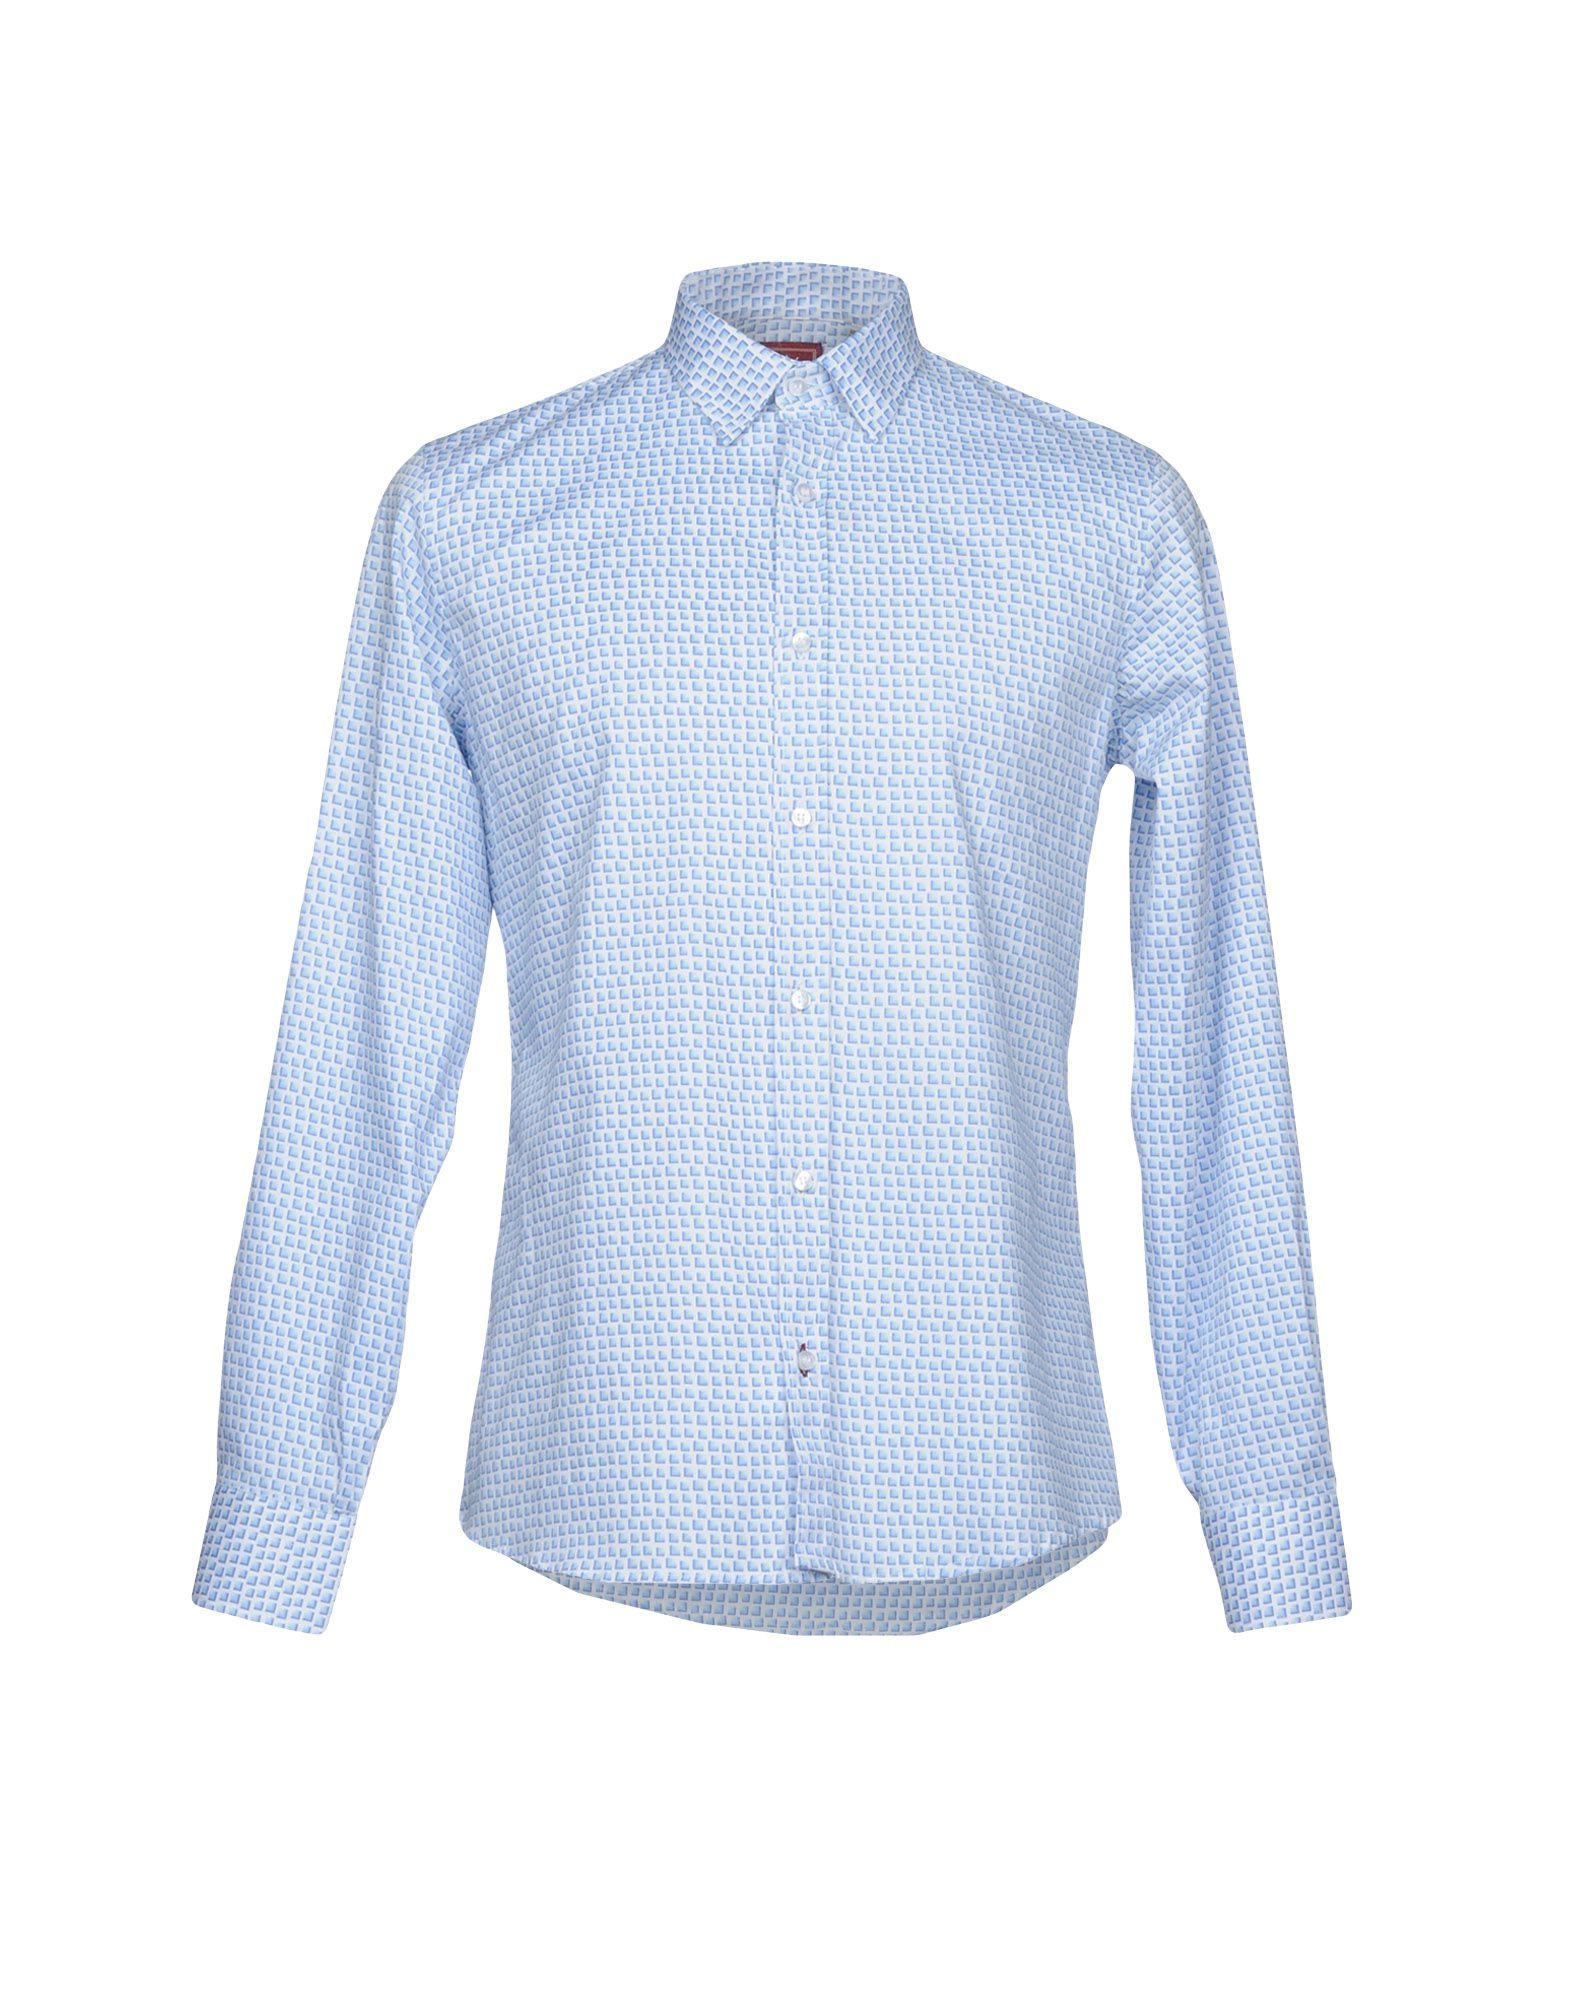 MORO Pубашка пуловер tony moro tony moro to046emobl41